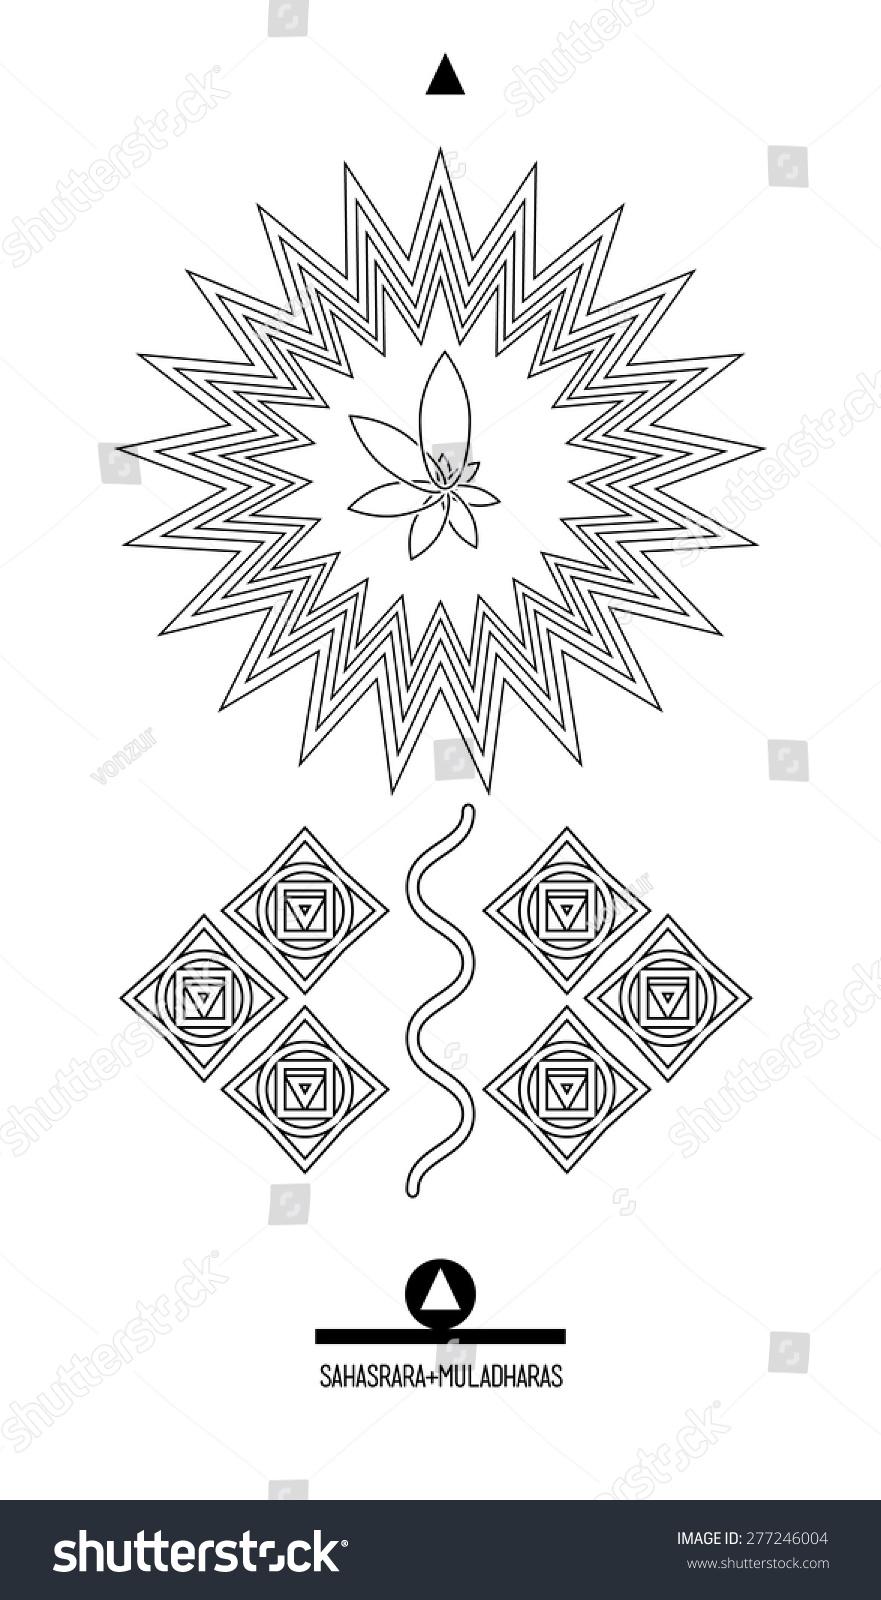 Sahasrara muldaharas buddhist hindu tantric symbol stock vector buddhist hindu tantric symbol harmony and balance cosmos and the universe biocorpaavc Images